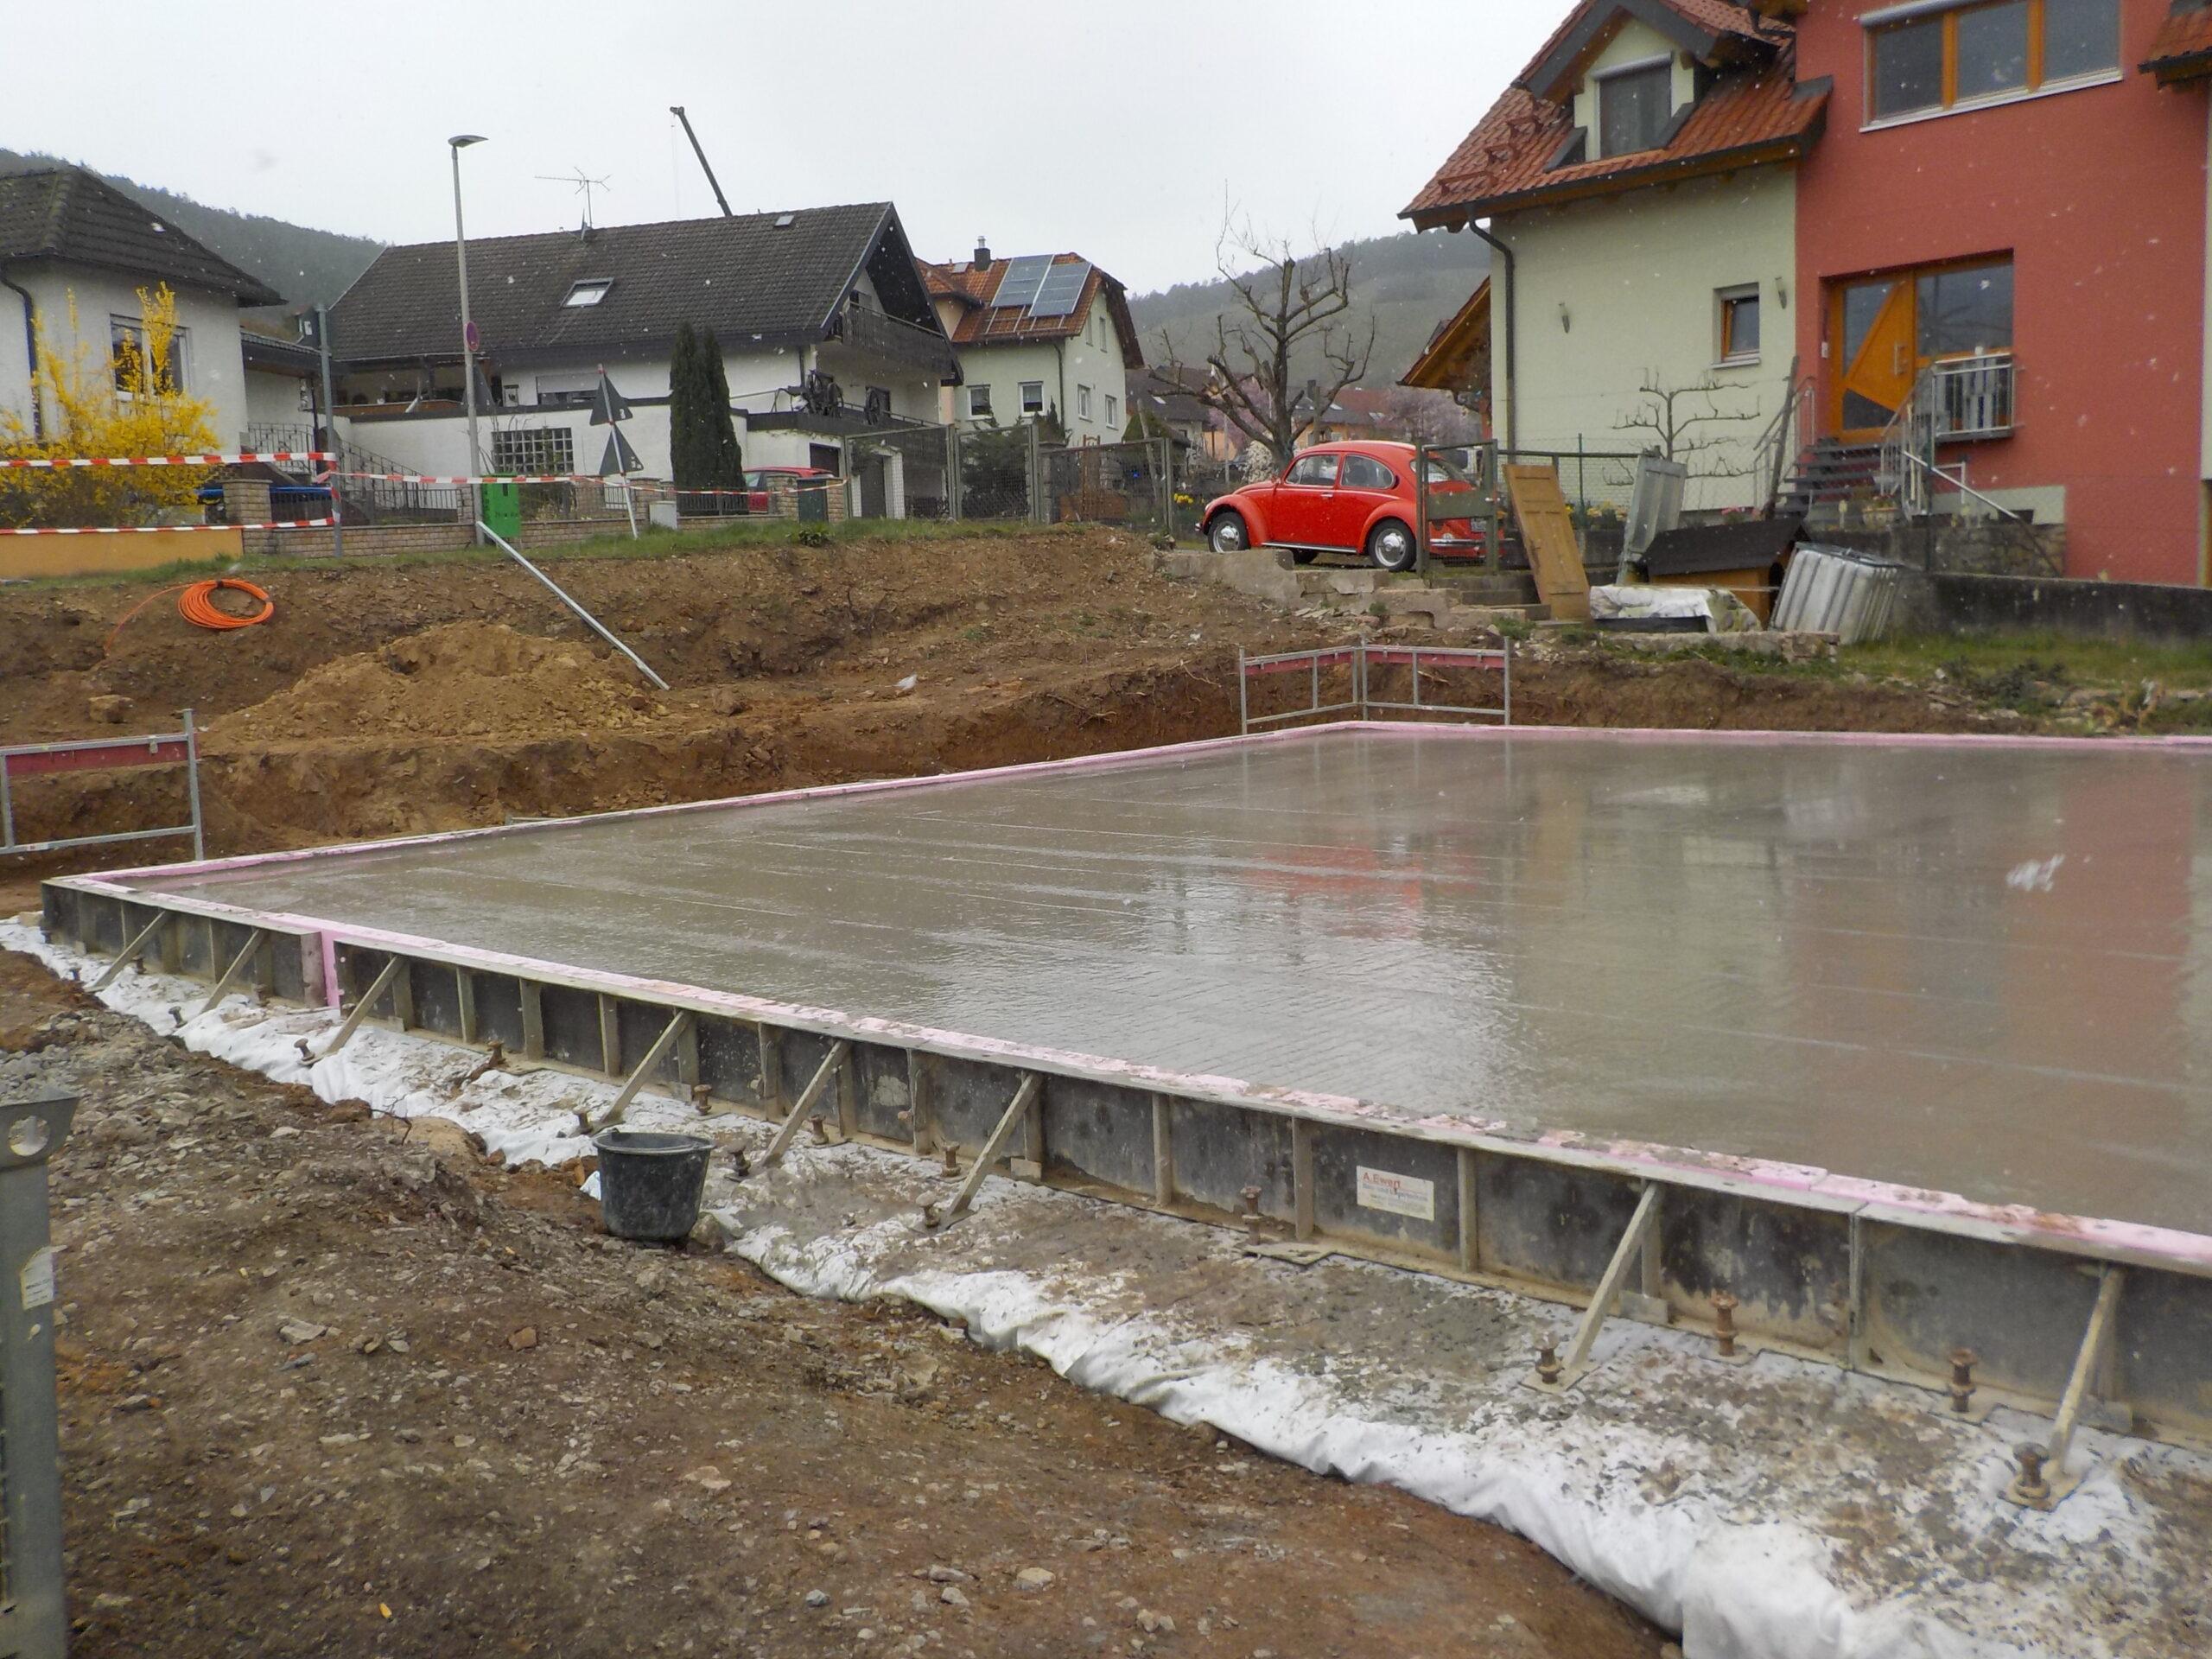 Bodenplatte - Graf-Rieneck-Strasse 20 - Erlabrunn (1)